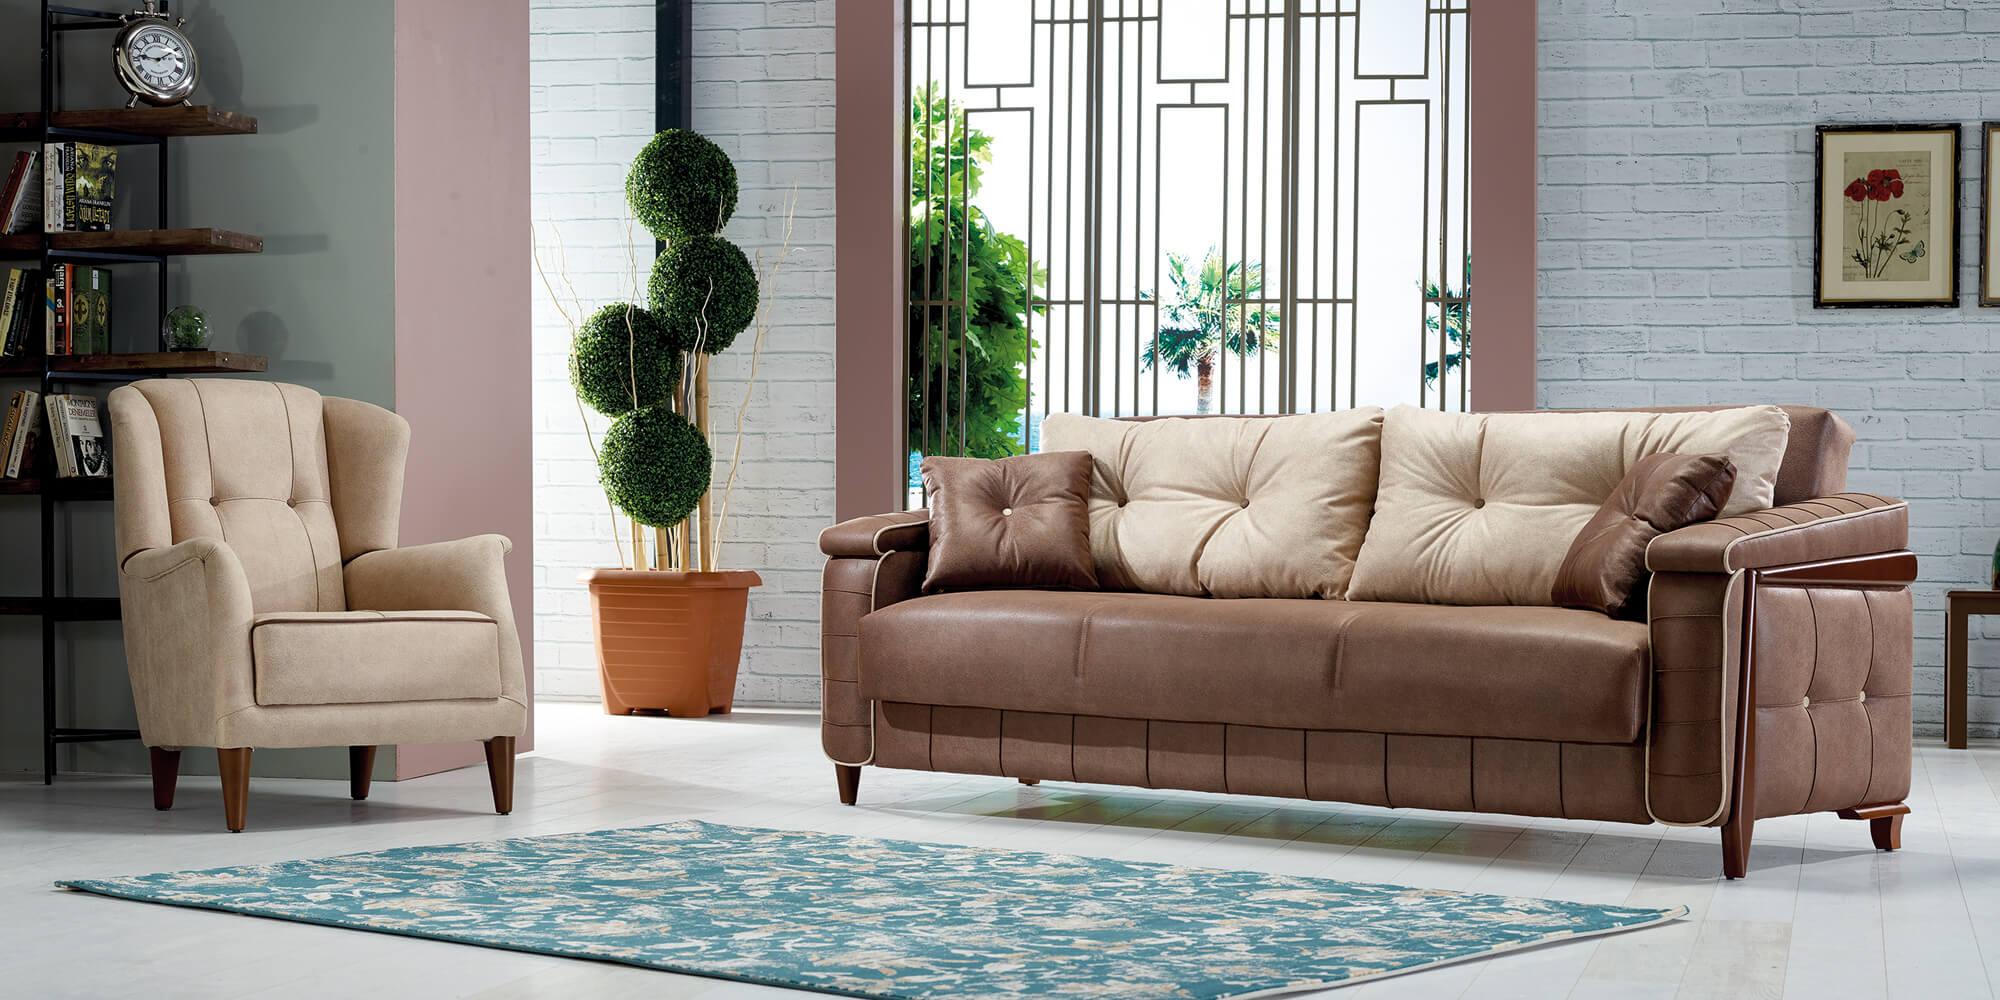 flat 3 2 1 delux sofa set yuvam m belhaus in wuppertal cilek offizieller h ndler in europa. Black Bedroom Furniture Sets. Home Design Ideas